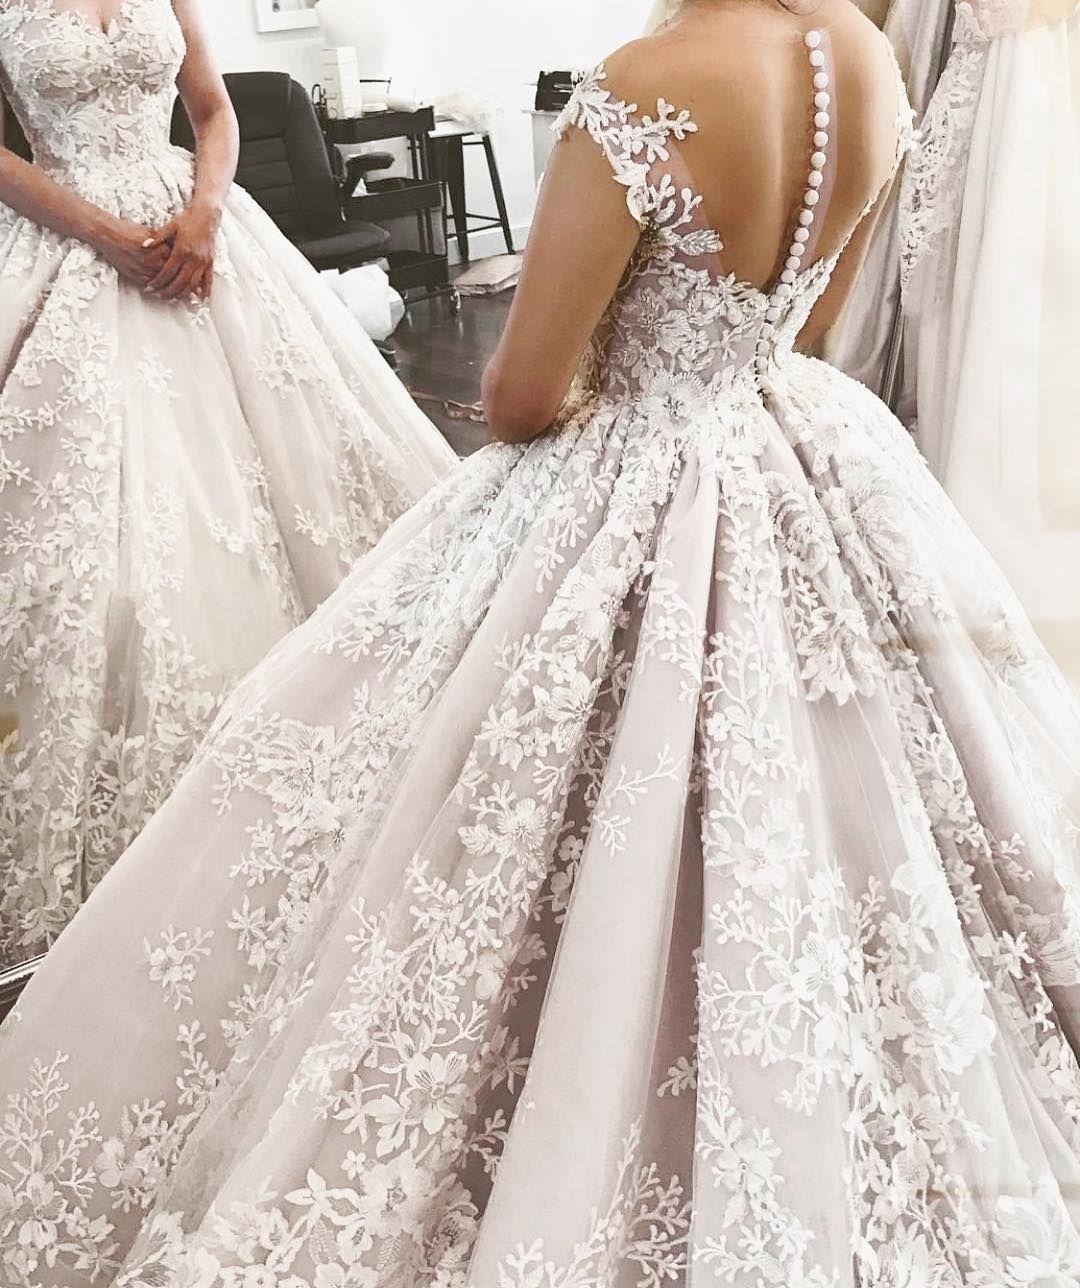 Pin by melina korfonta on dresses pinterest wedding dress